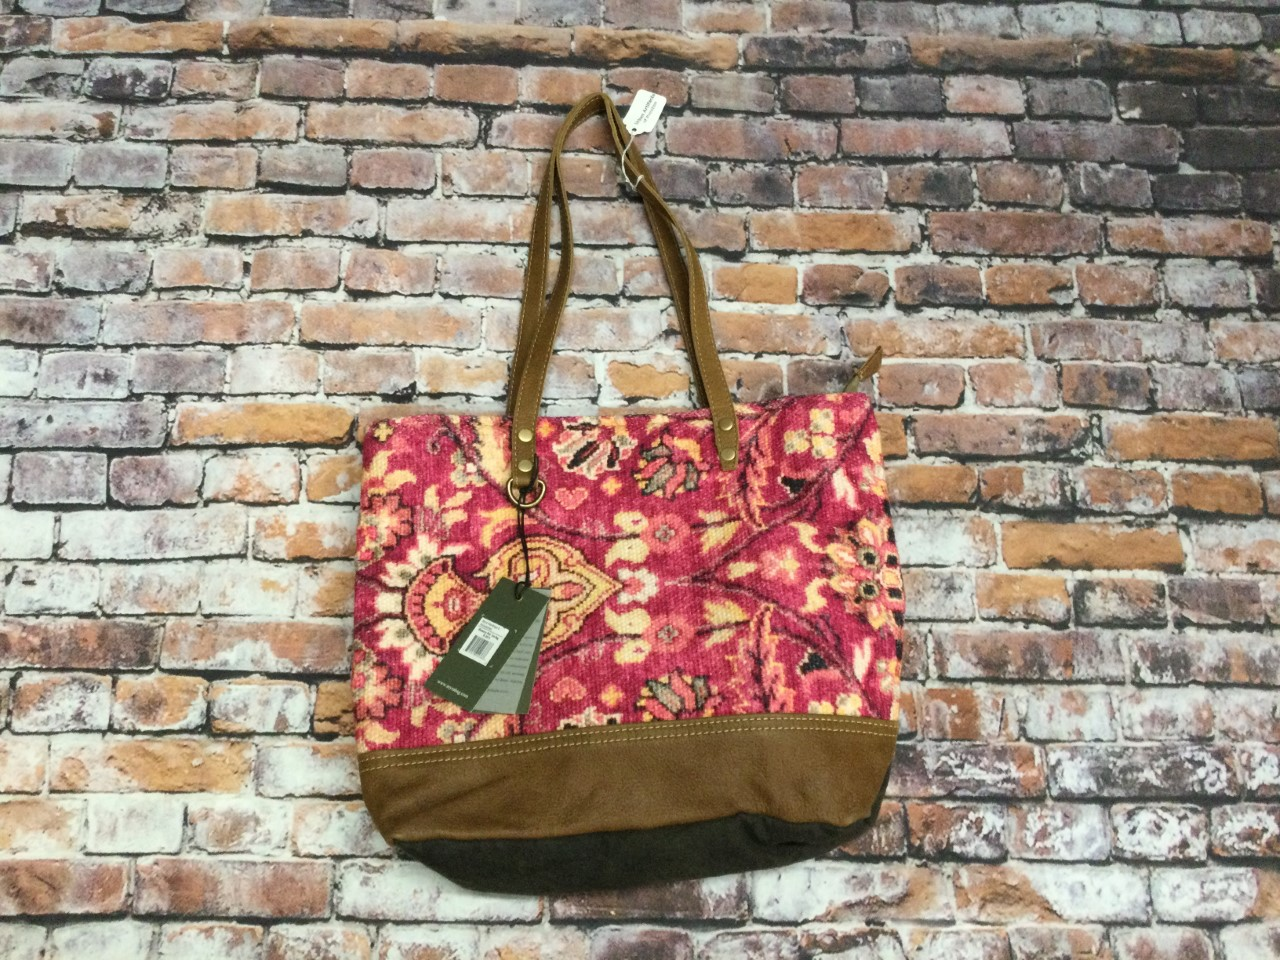 Blossomy Pink Tote Bag